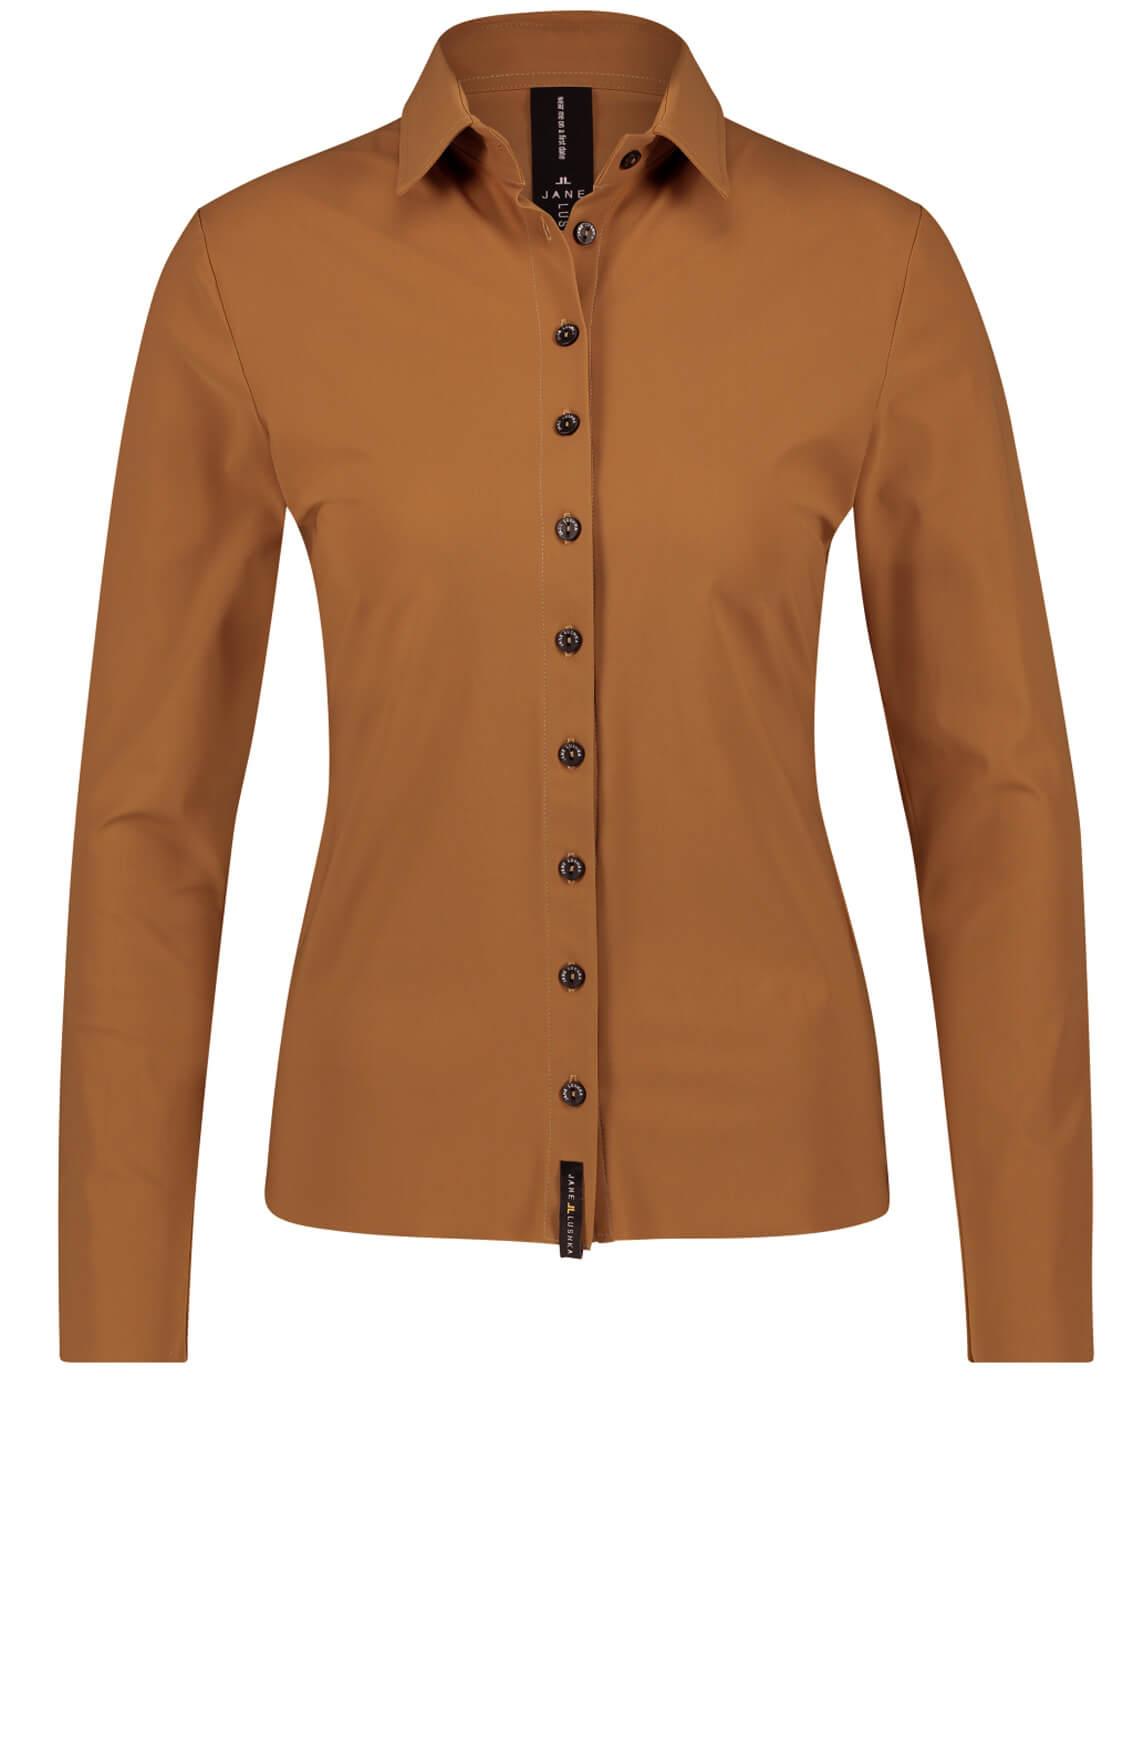 Jane Lushka Dames Kikkie blouse Bruin